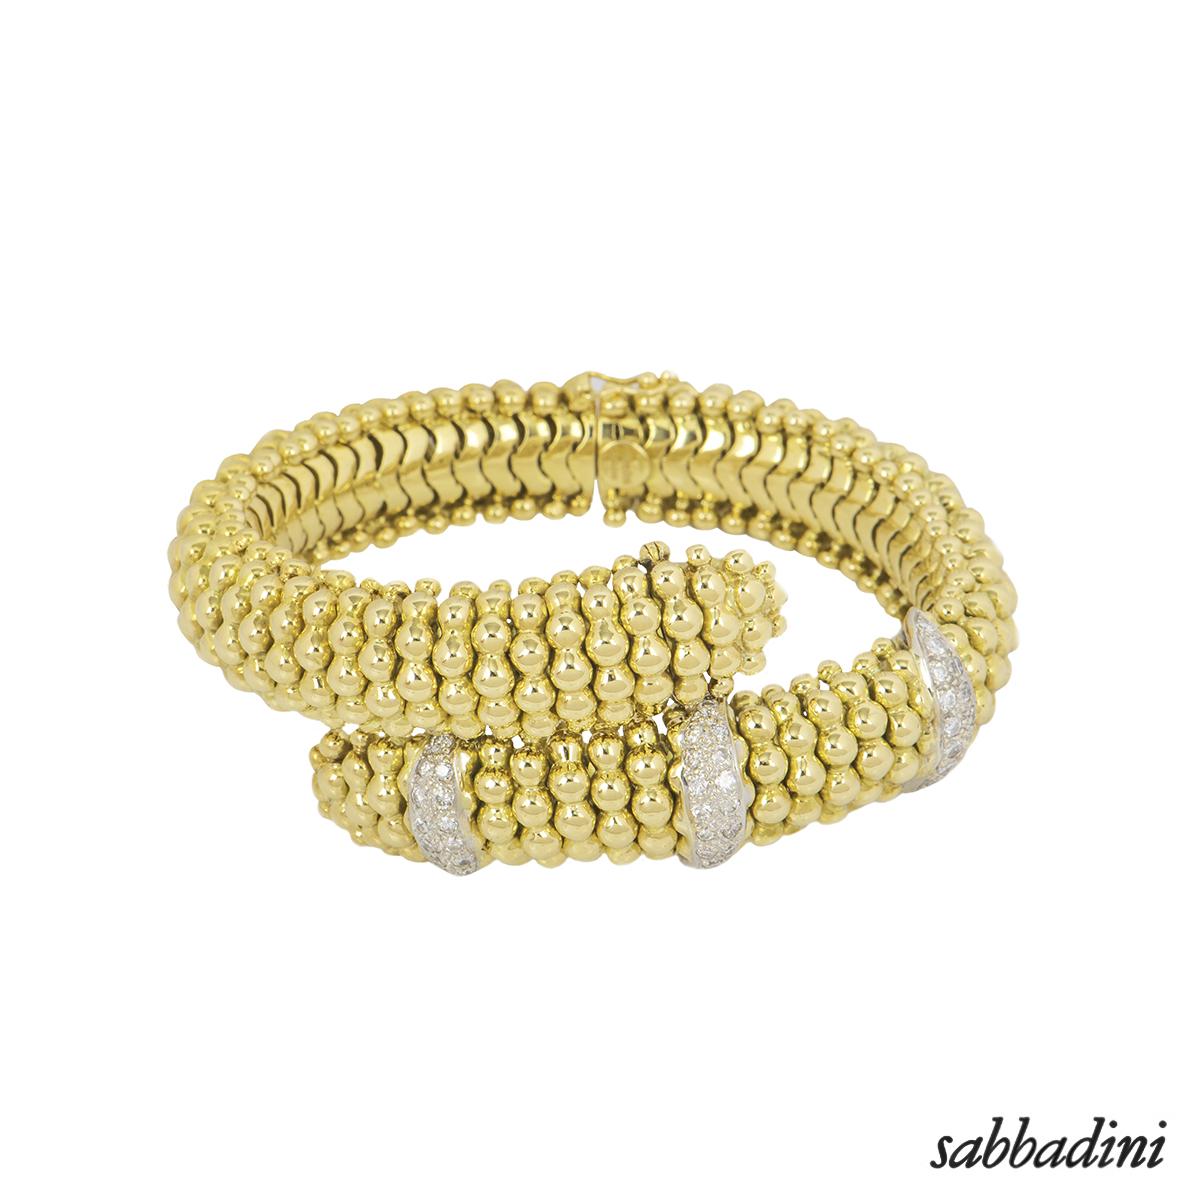 Sabbadini Yellow Gold Diamond Suite